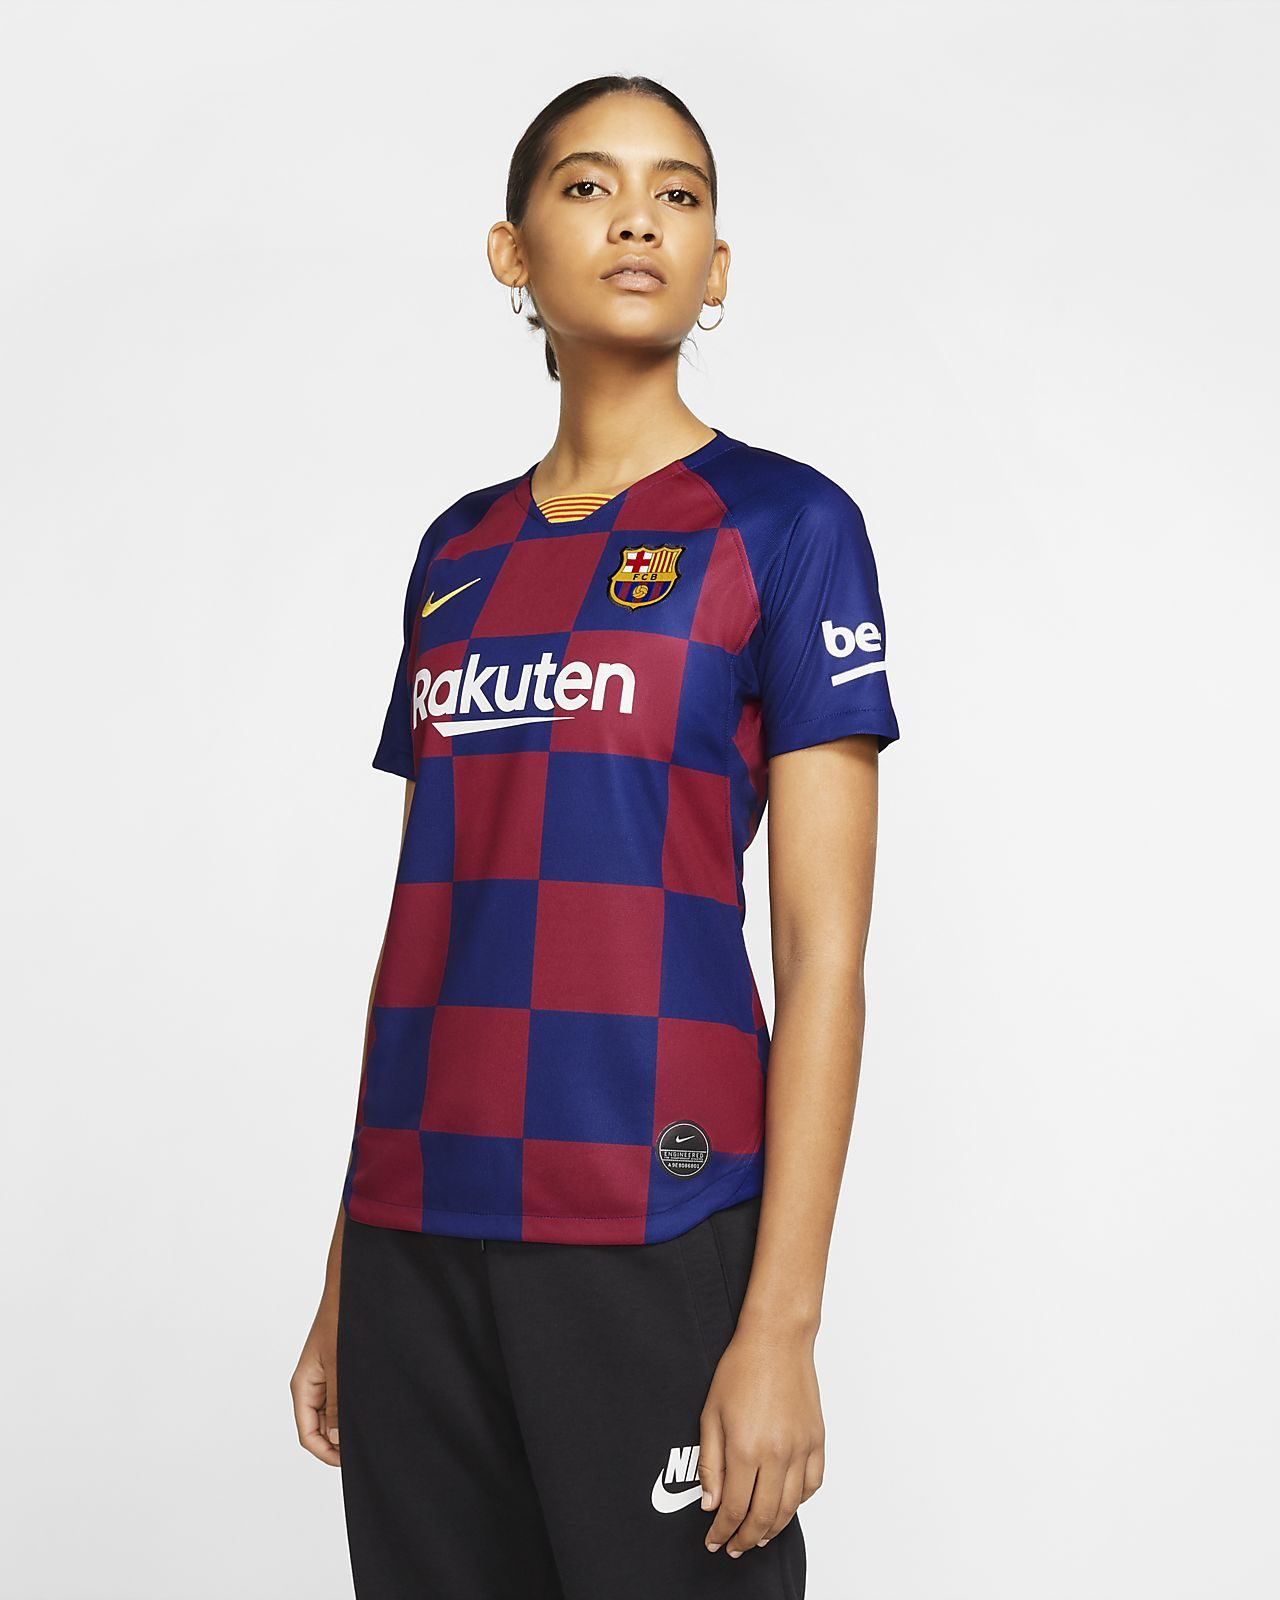 new arrivals 58970 96746 FC Barcelona 2019/20 Stadium Home Women's Soccer Jersey